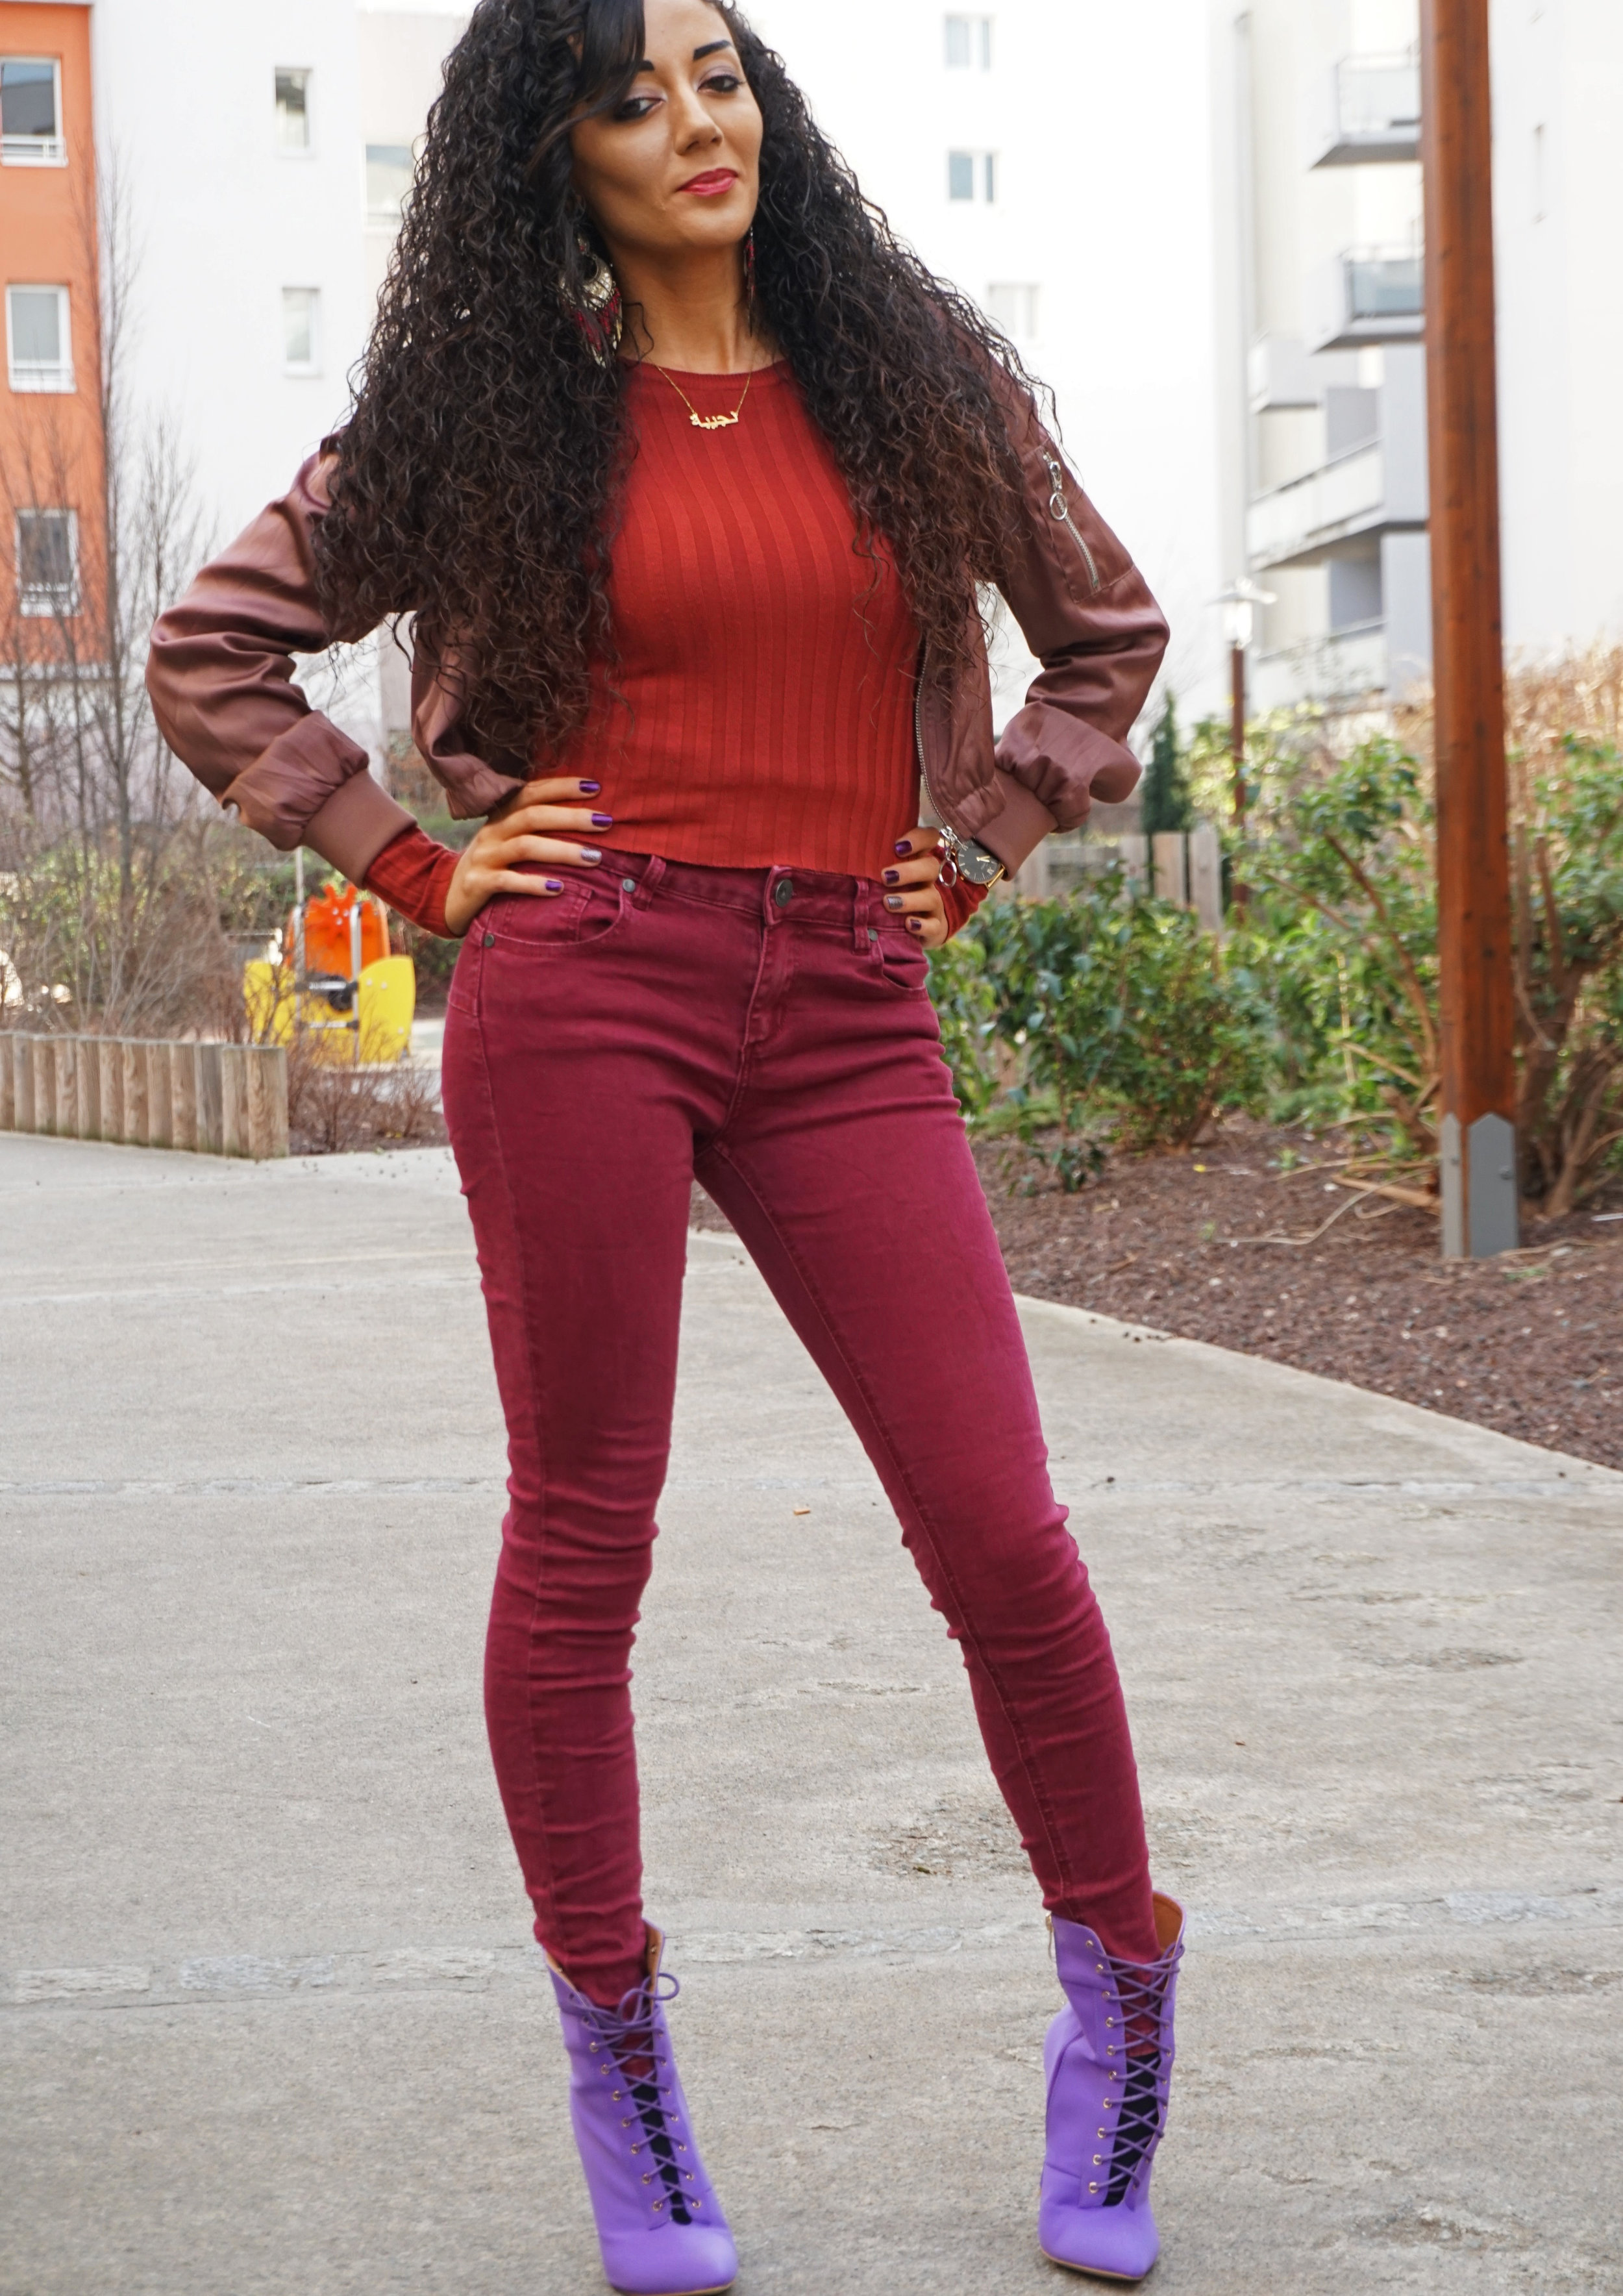 burgundy outfit lookbook - curly hair